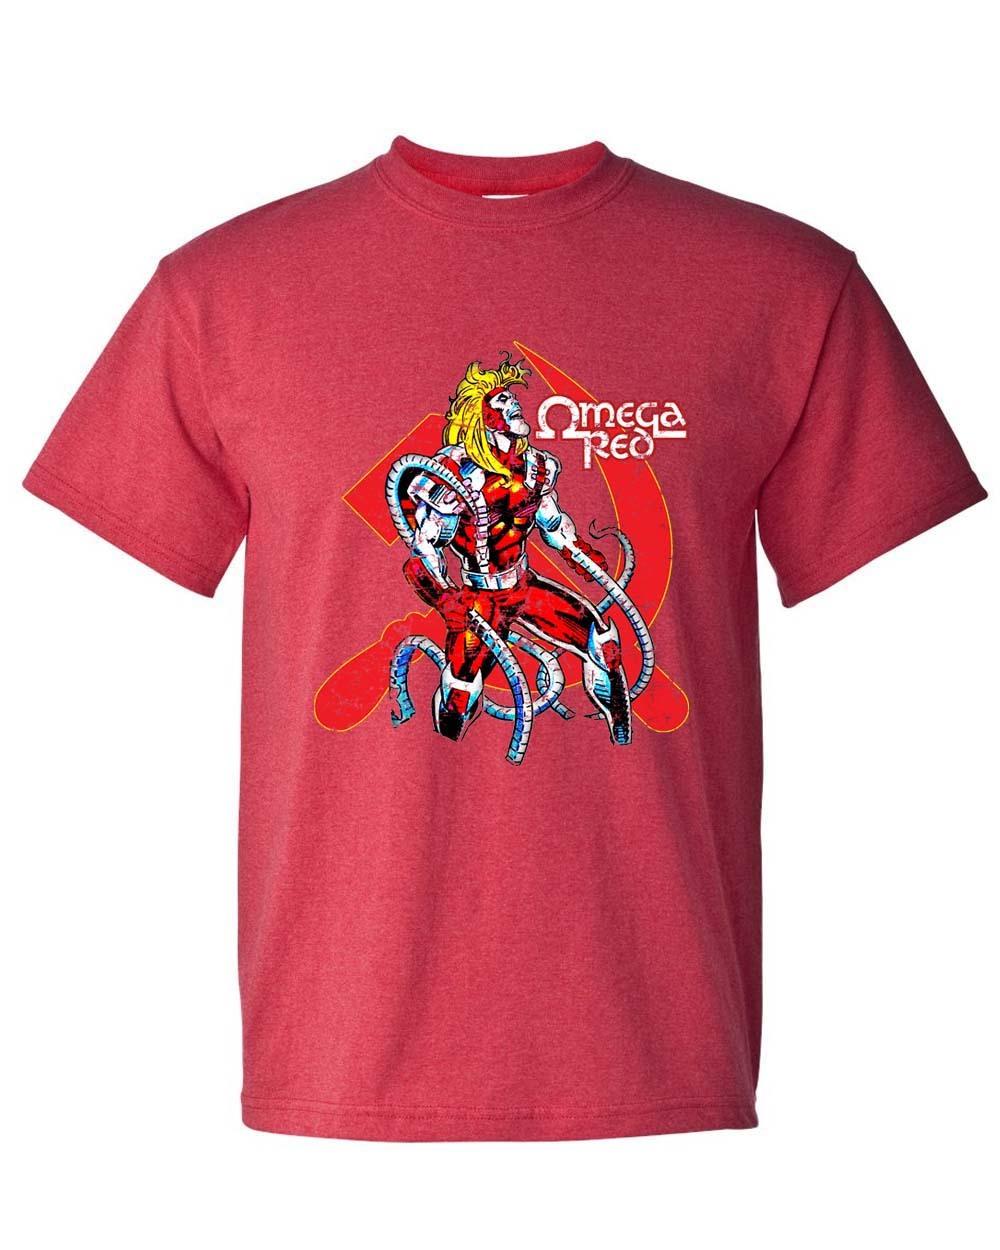 Ine sabertooth x men weapon x super villians graphic tee for sale online t shirt storedistressed